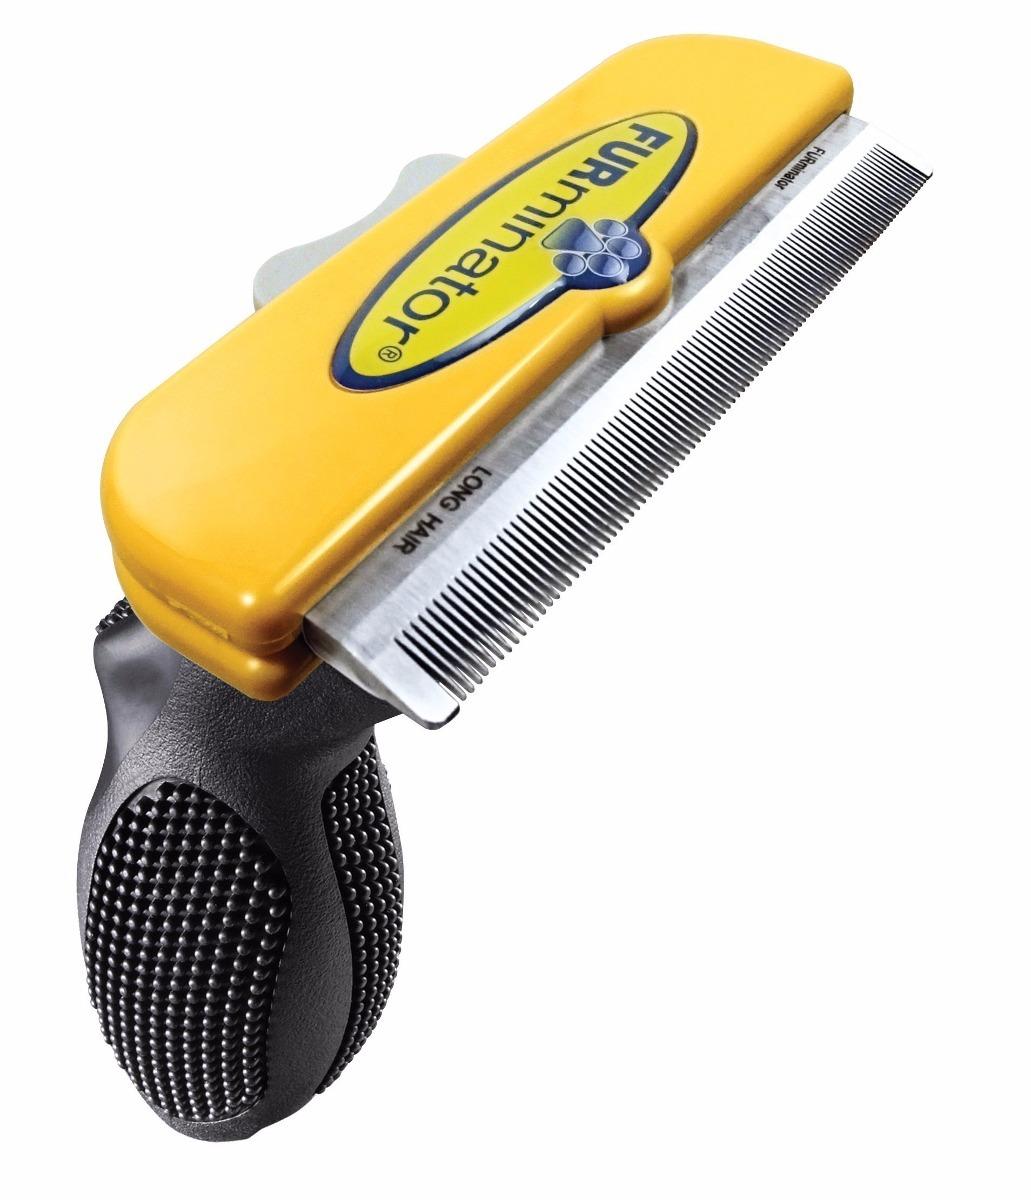 Furminator FURminator для собак крупных короткошерстных пород Short Hair Large Dog 10 см cepillo-furminator-para-perro-large-pelo-corto-D_NQ_NP_983511-MLA20564756895_012016-F.jpg